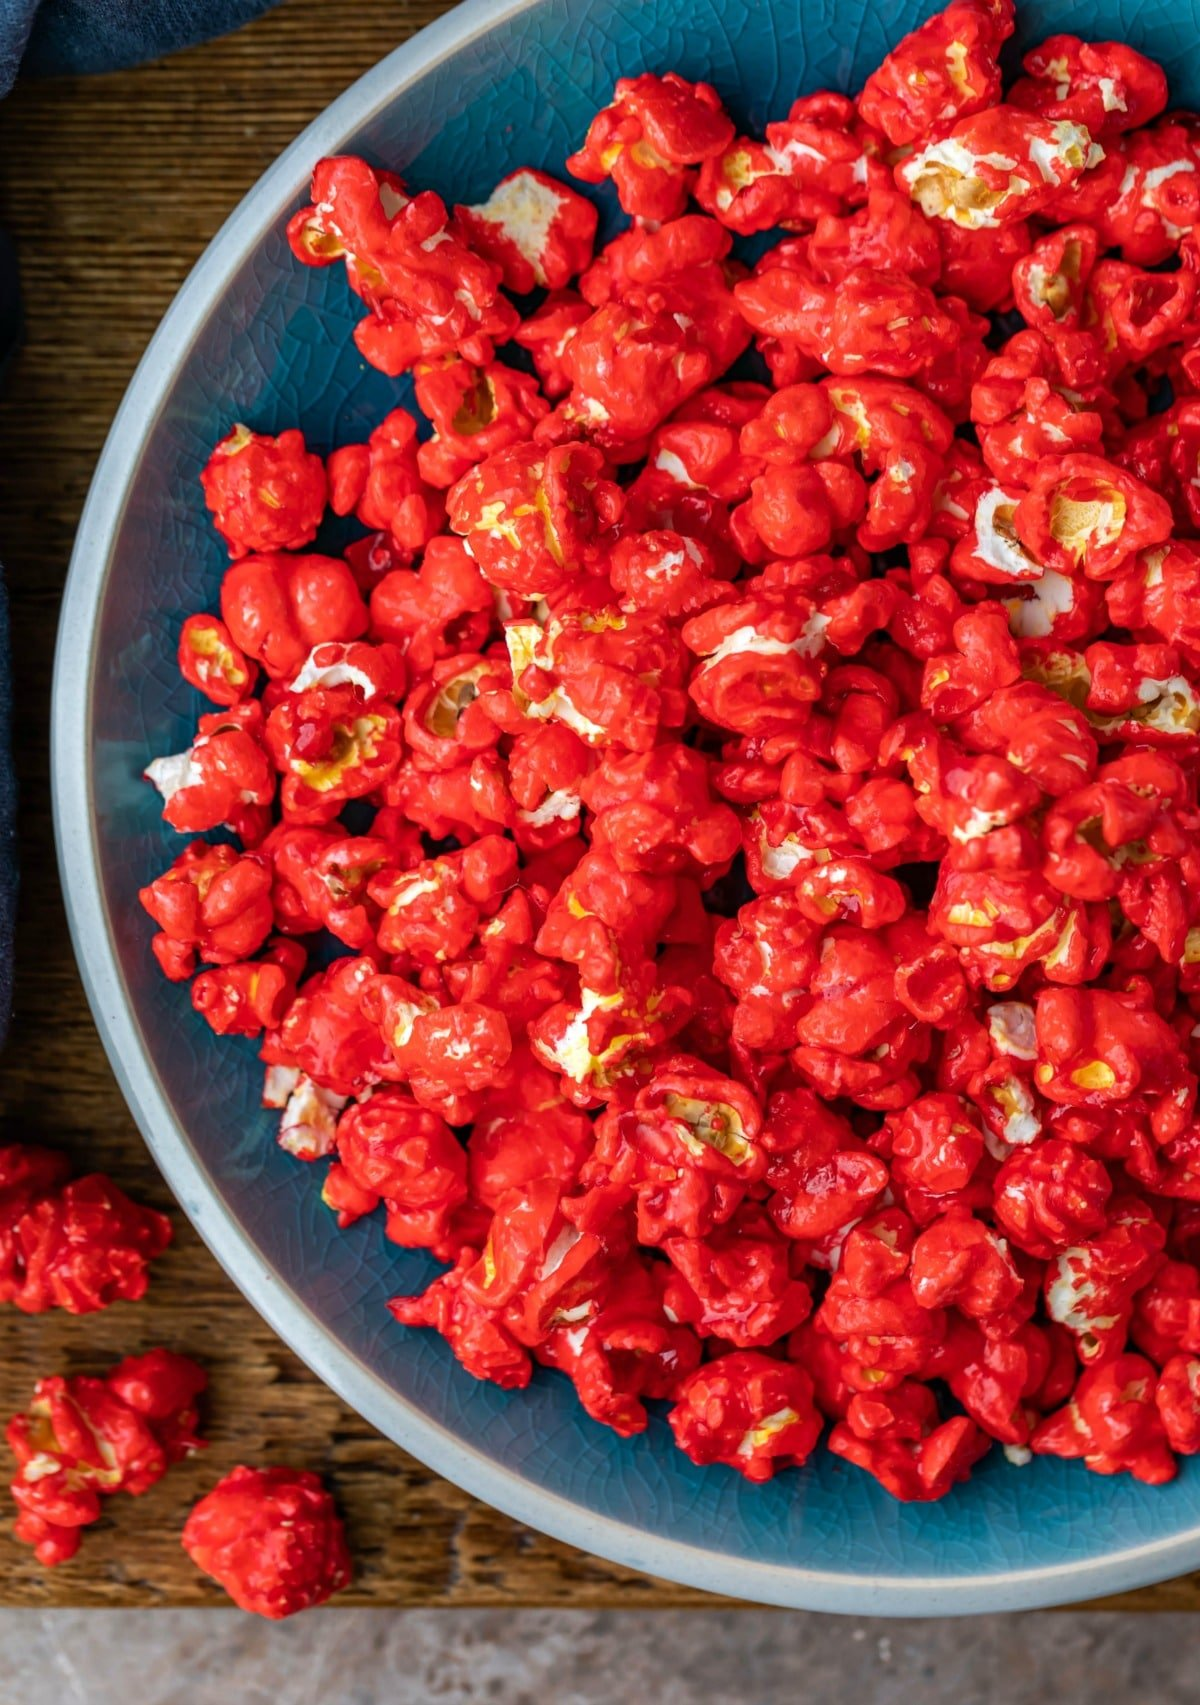 Red Hot Cinnamon Popcorn I Heart Eating